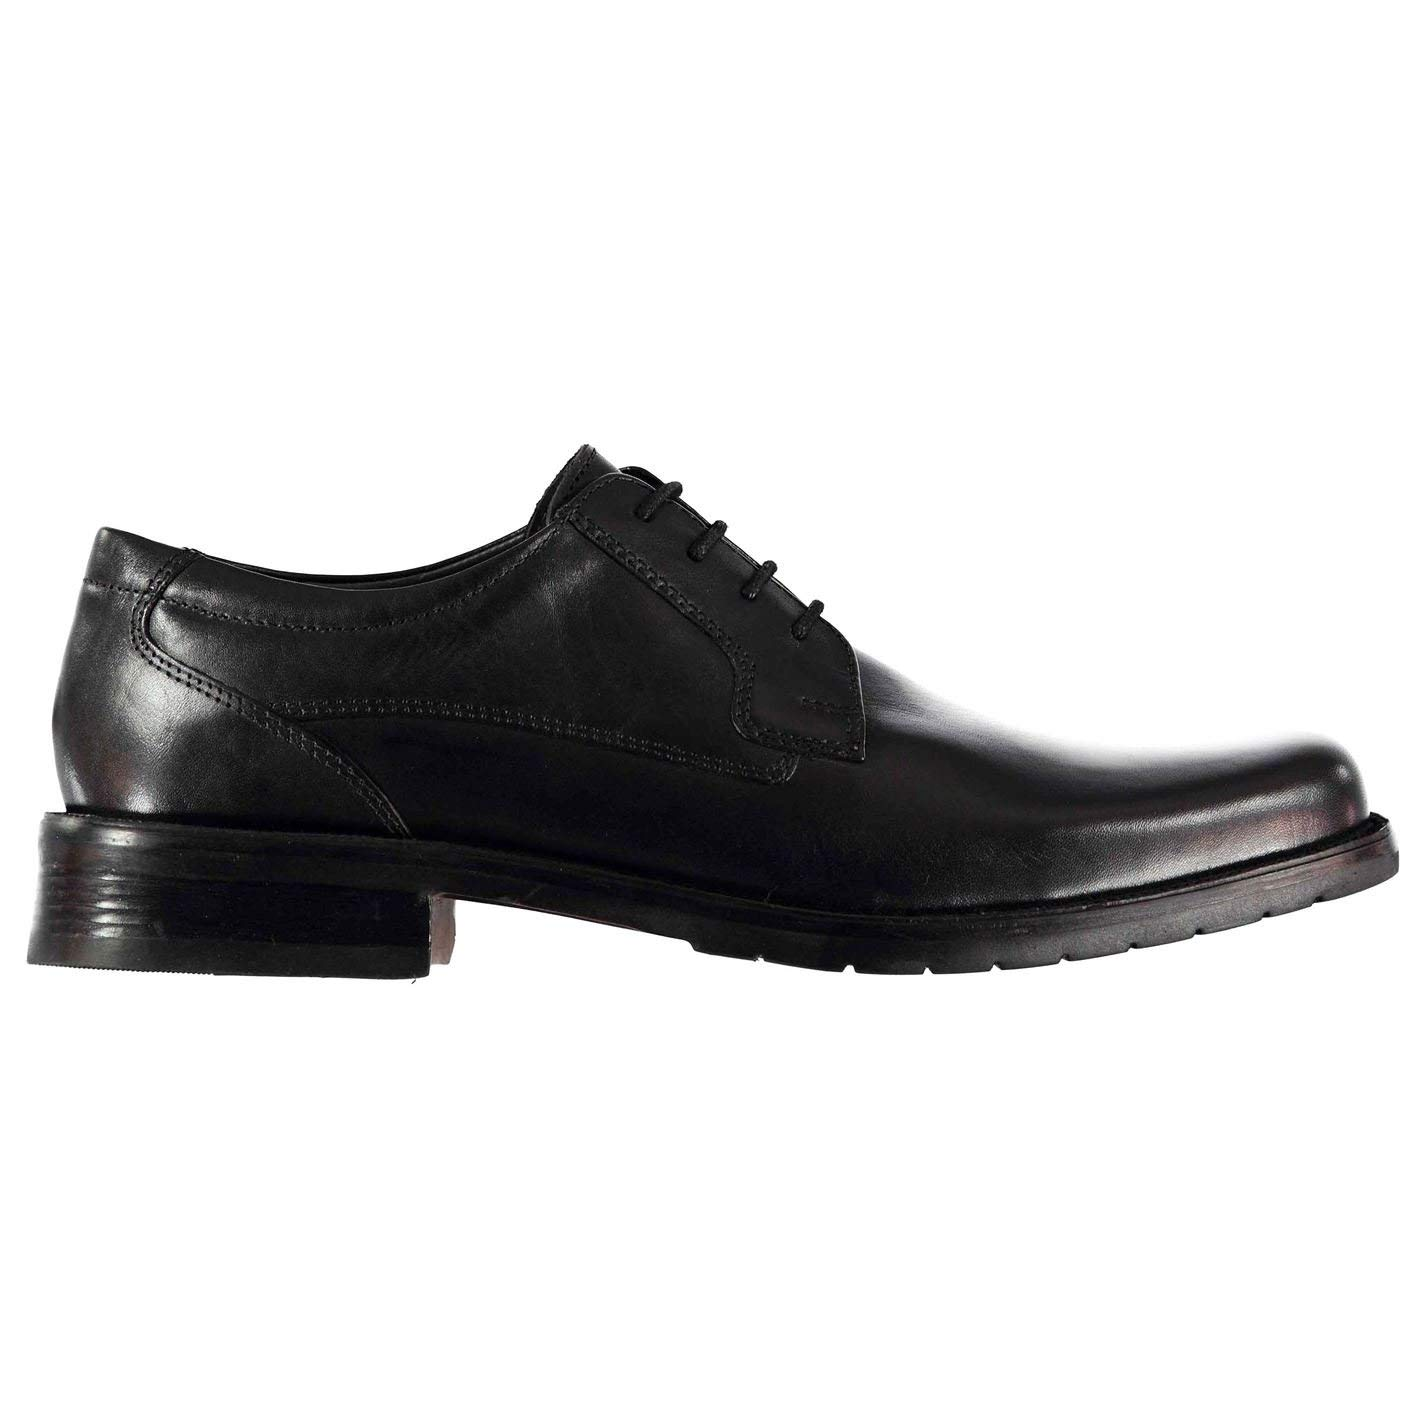 Kangol Mens Glinton Lace up Shoes Derby Slight Heel Formal